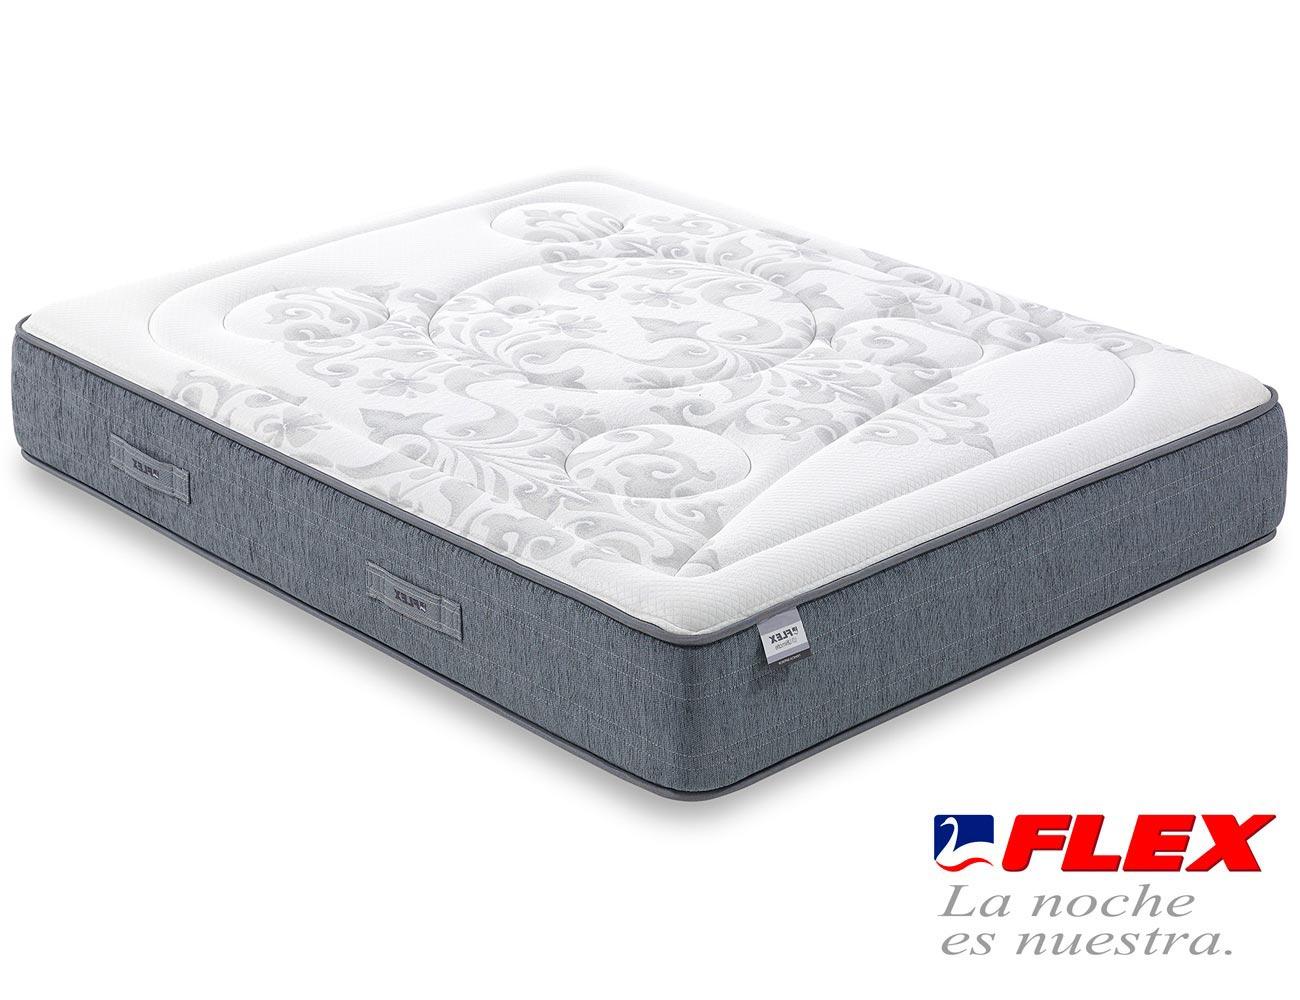 Colchon flex airvex viscoelastica gel 6 superior